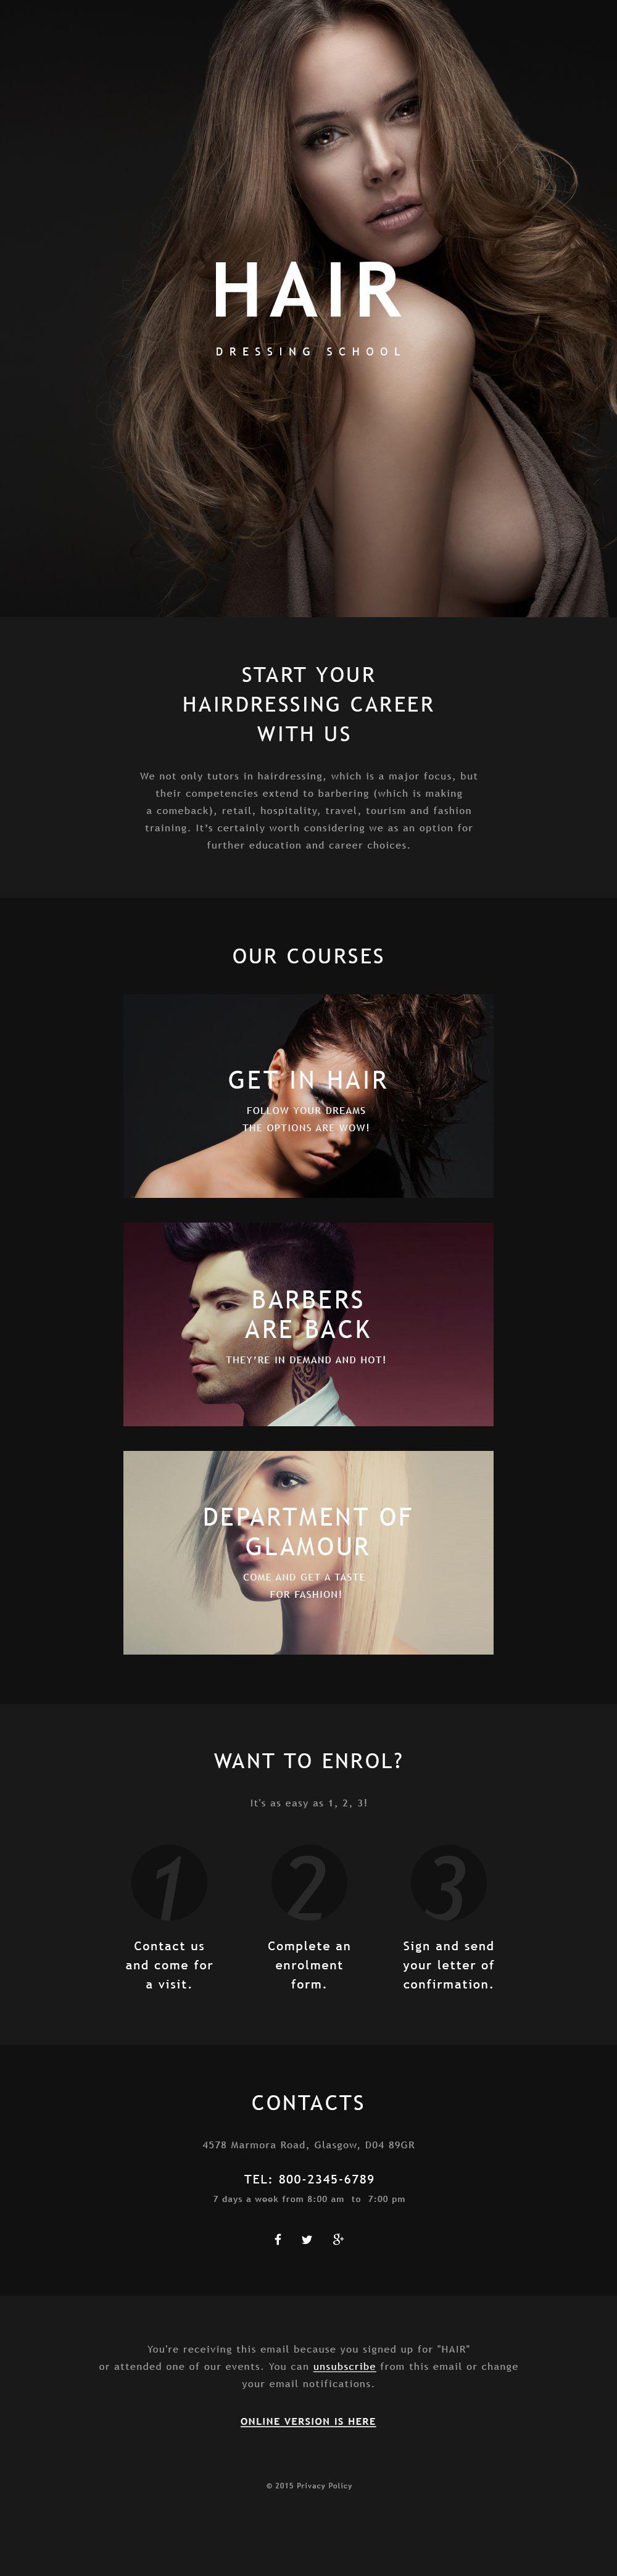 Responsywny szablon Newsletter #55585 na temat: salon fryzjerski - zrzut ekranu